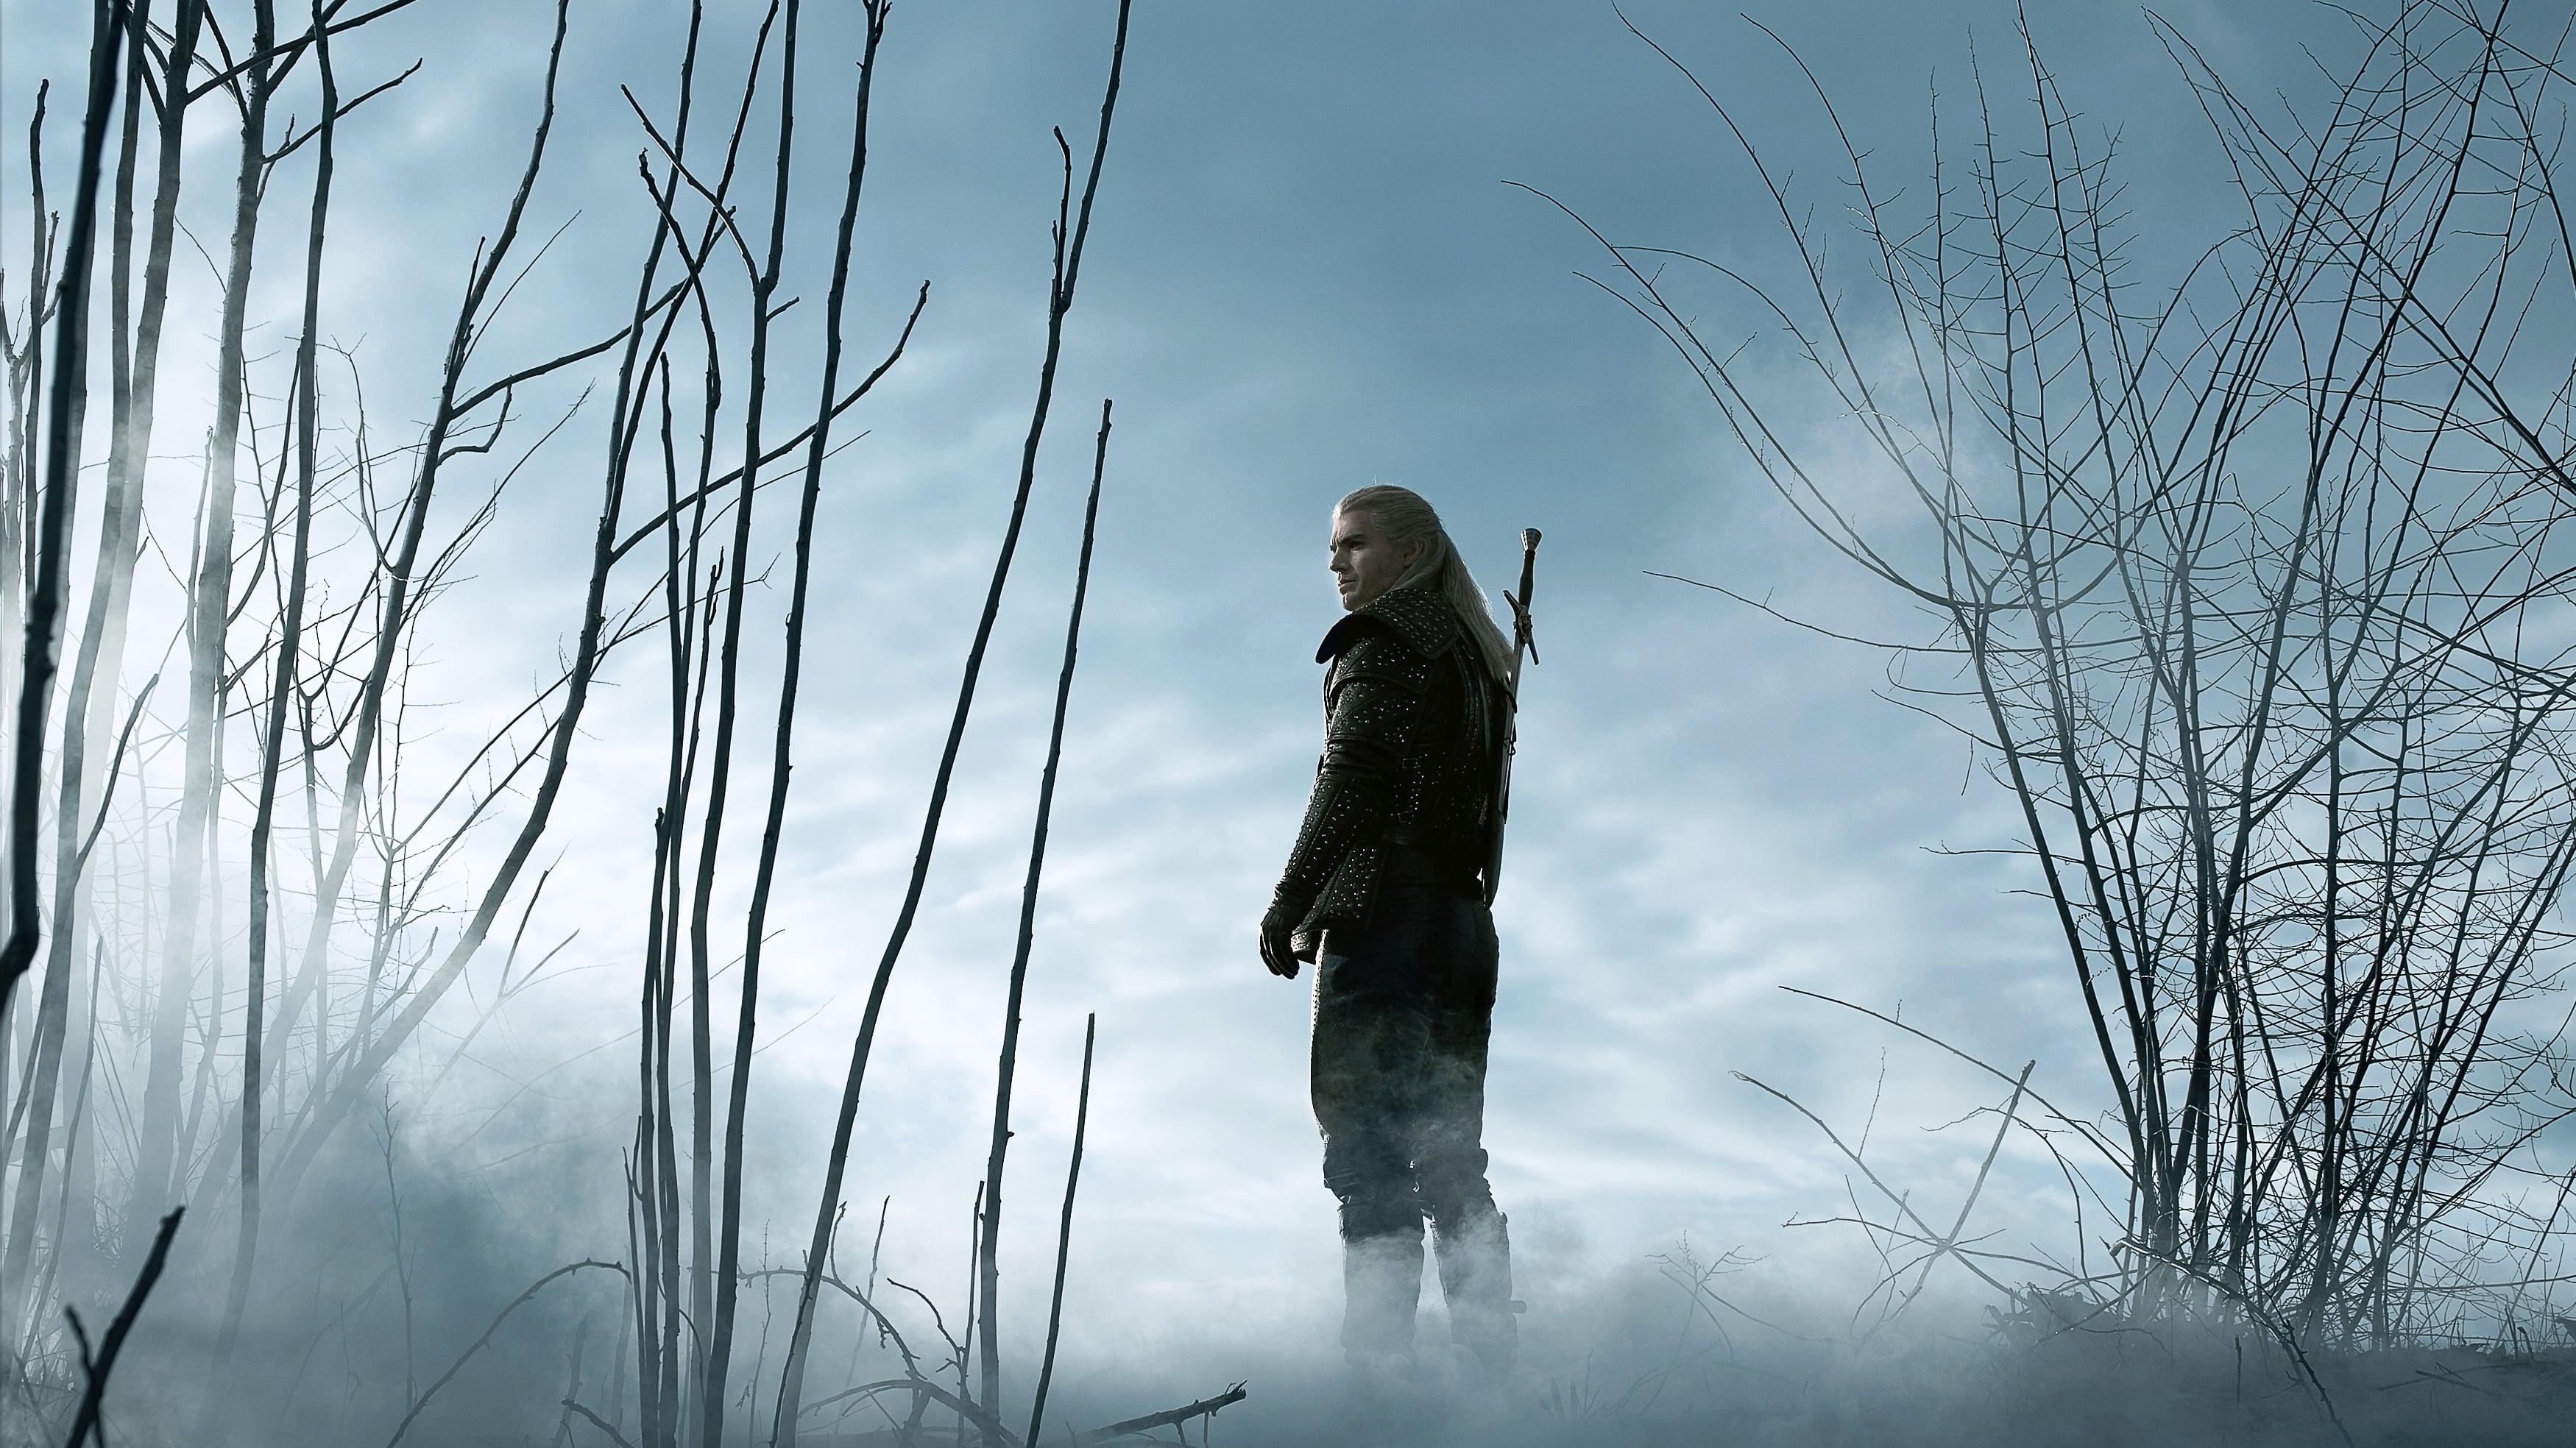 The Witcher - Season 1